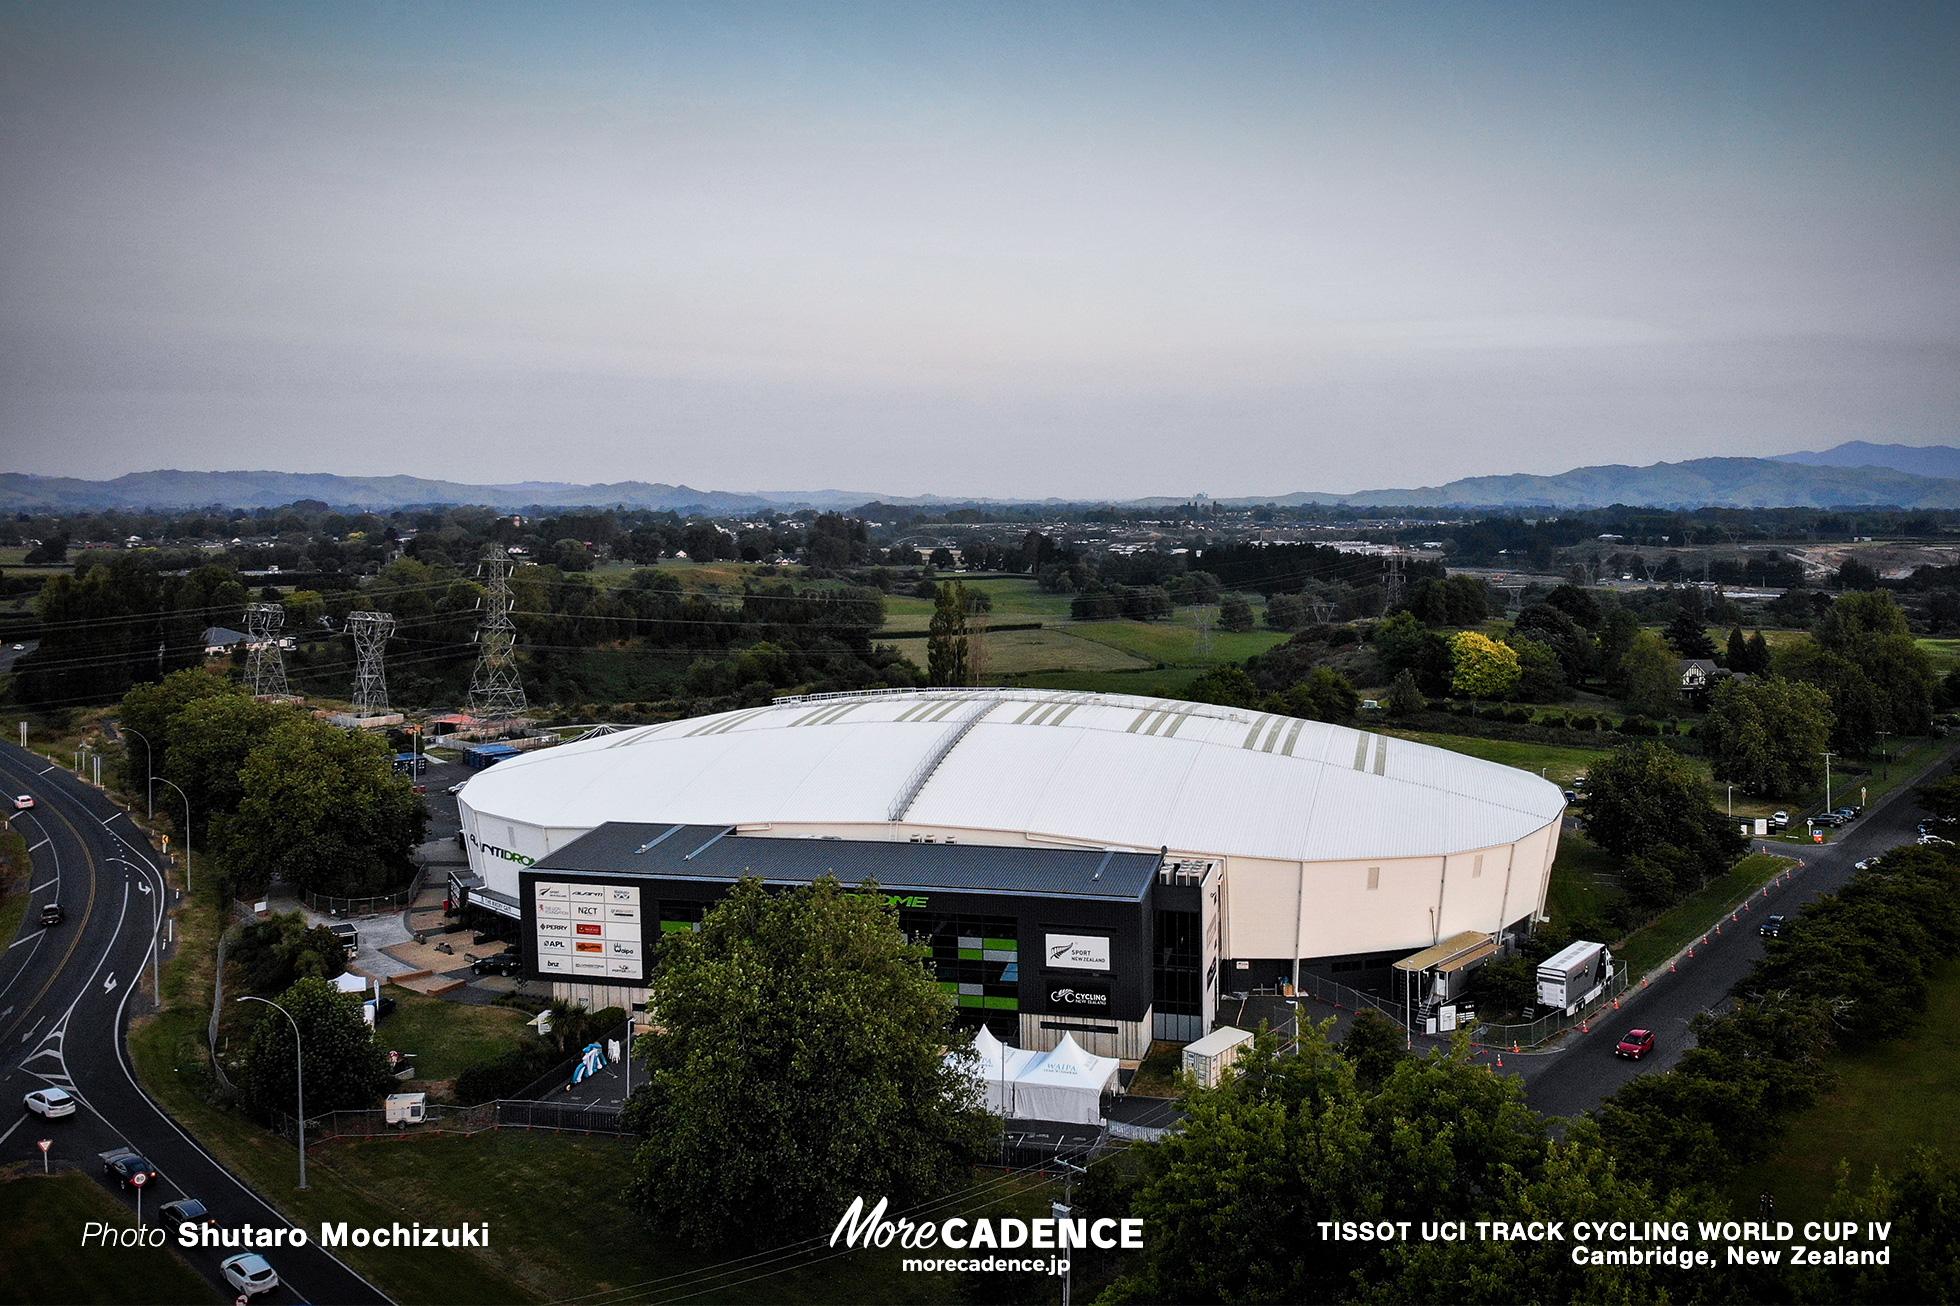 TISSOT UCI TRACK CYCLING WORLD CUP IV, Cambridge, New Zealand